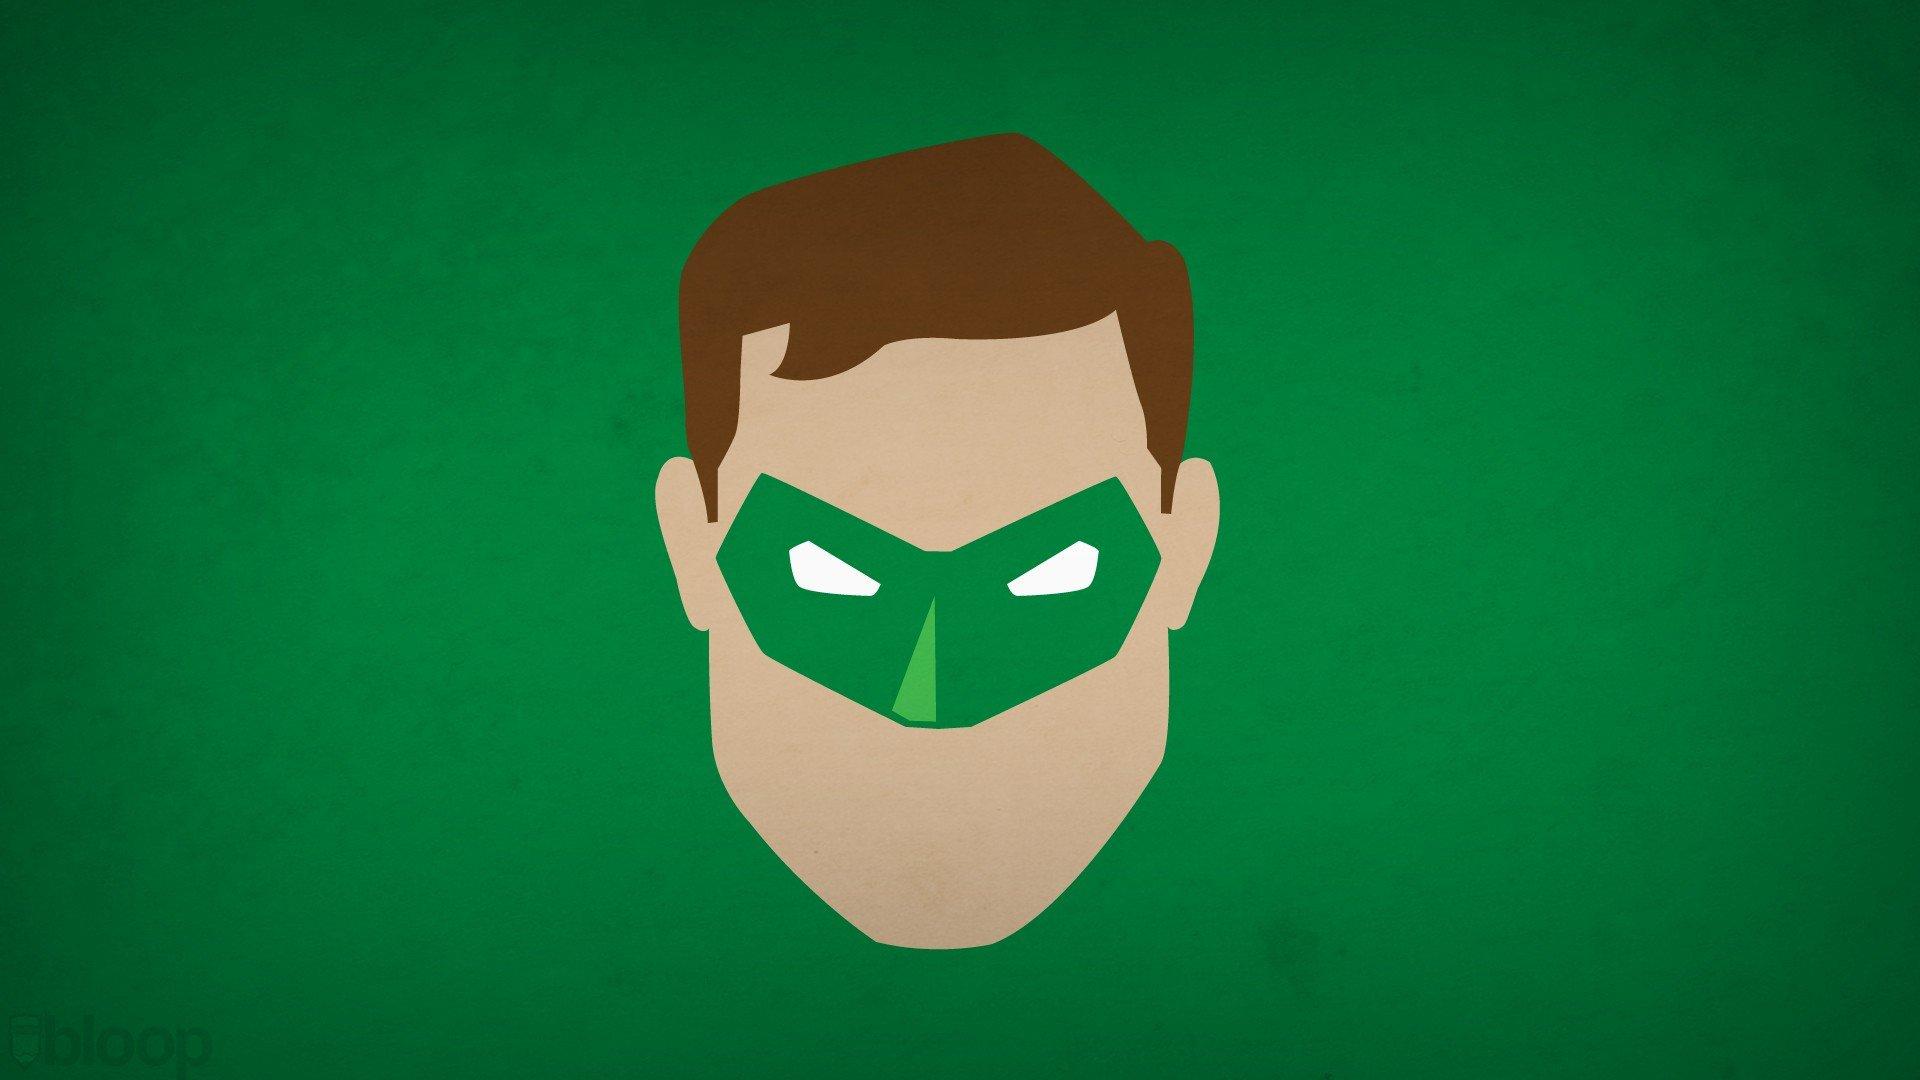 Lantern minimalistic superheroes green background blo0p wallpaper 1920x1080